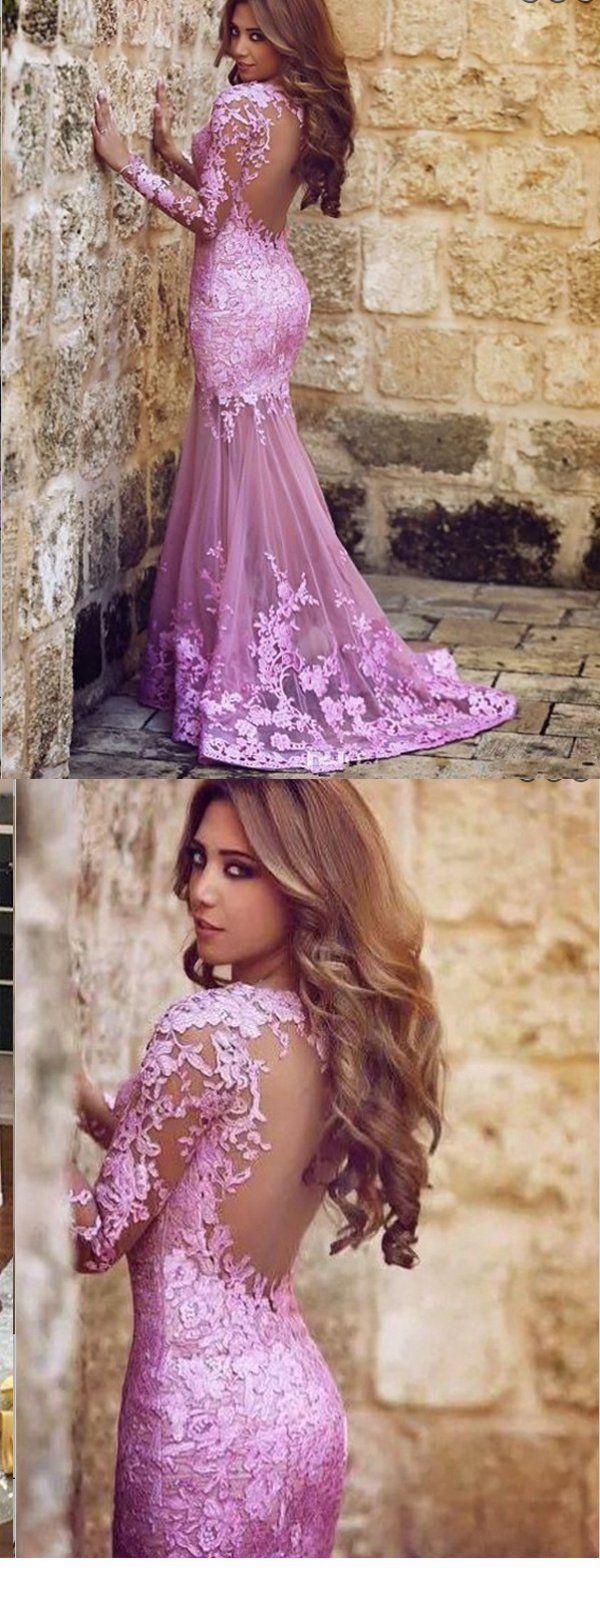 Mermaid long sleeves open back purple tulle prom dress cheap prom